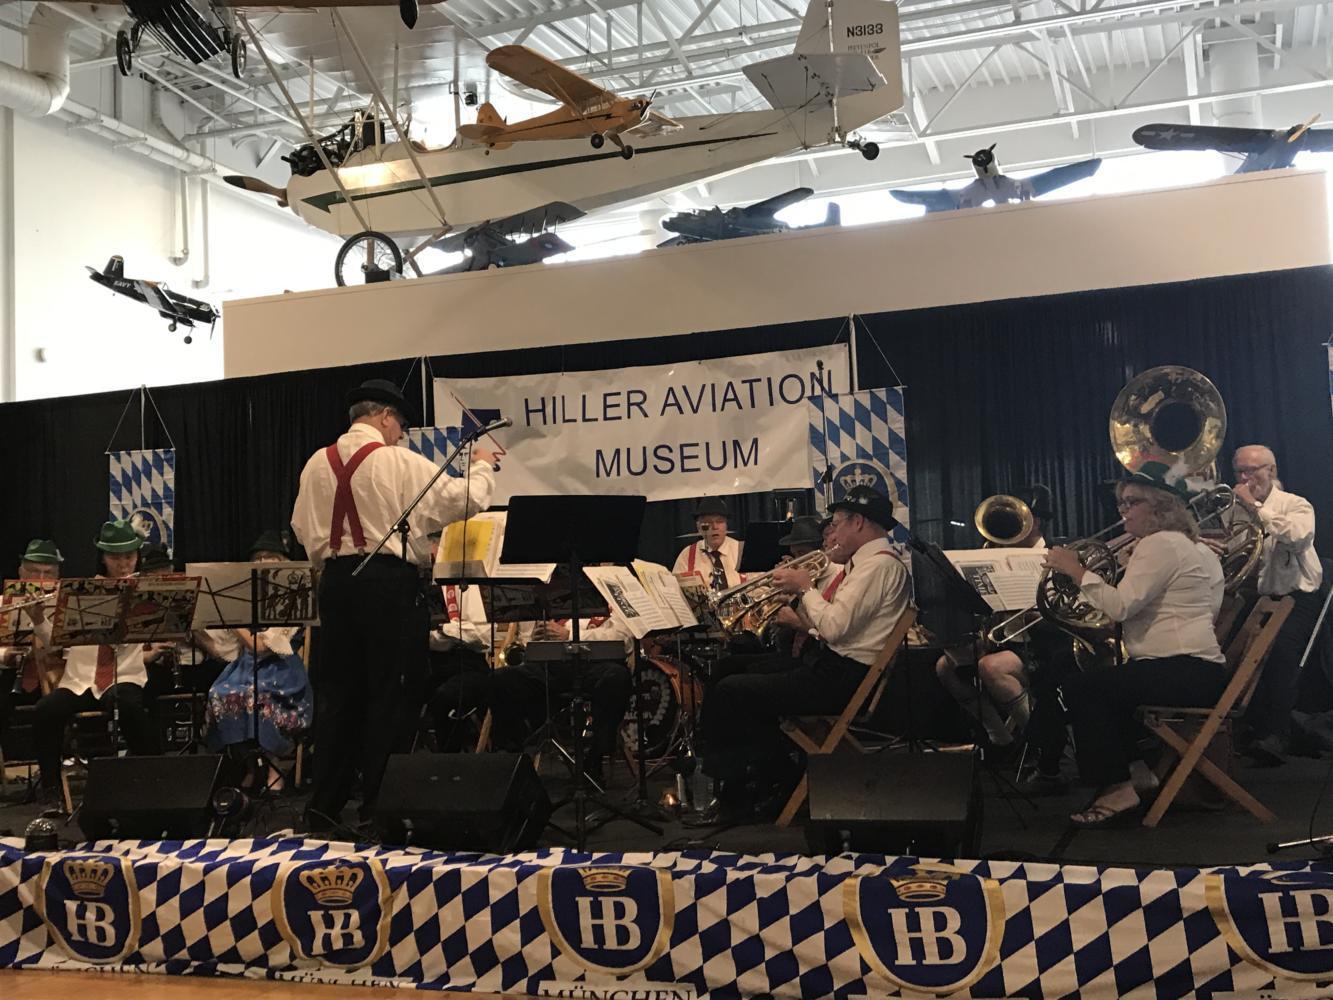 San Mateo Elks Concert Band performs traditional German folk music live.